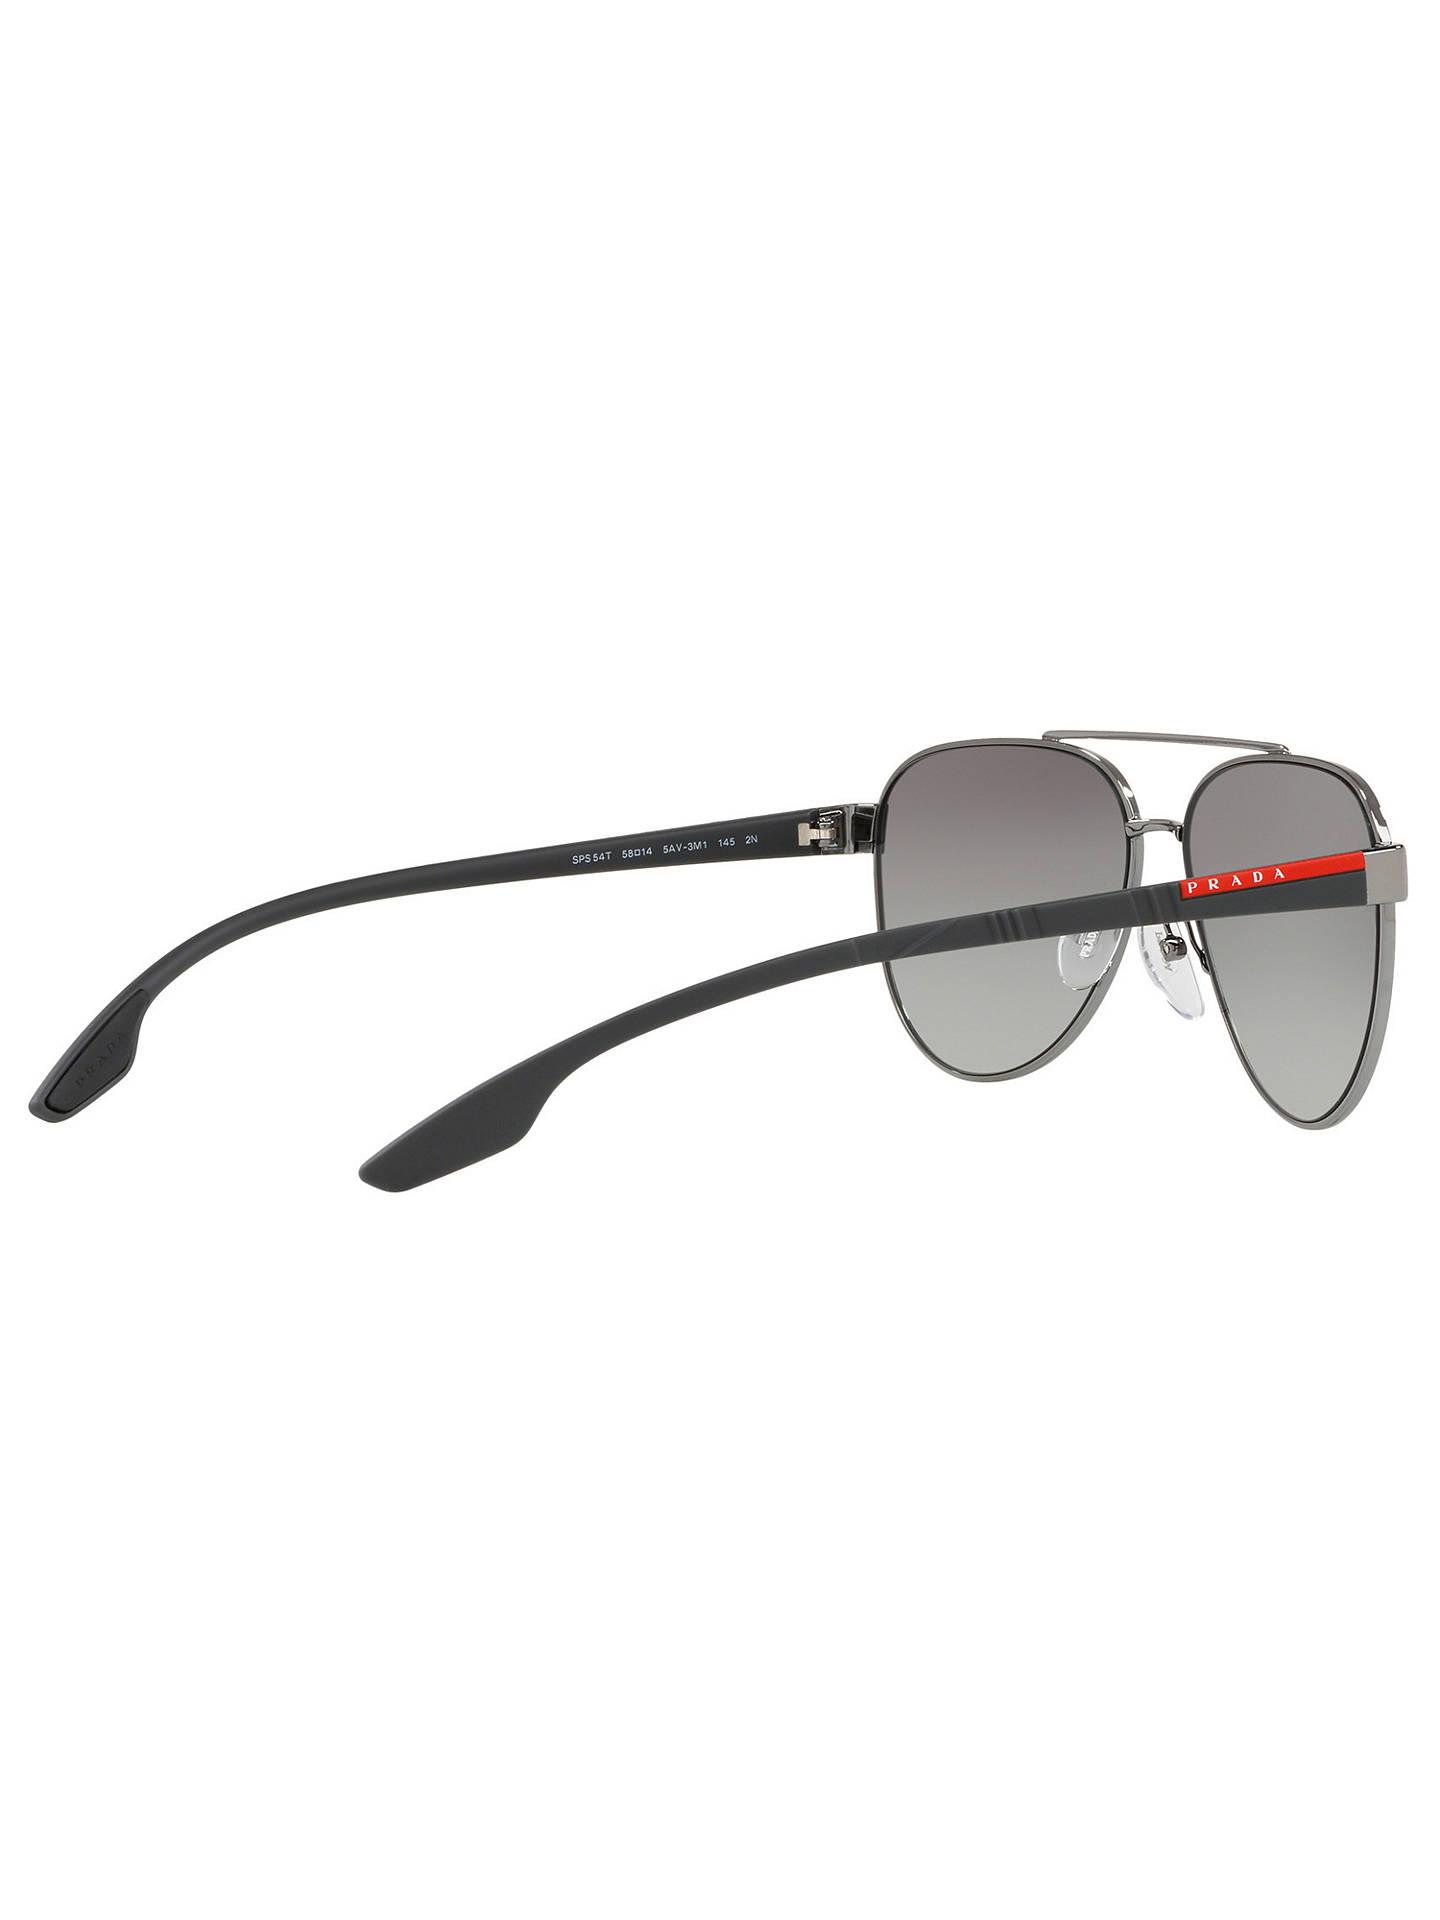 0dca5a8d1234a ... order buyprada linea rossa ps 54ts mens aviator sunglasses gunmetal  grey gradient online at johnlewis 3a634